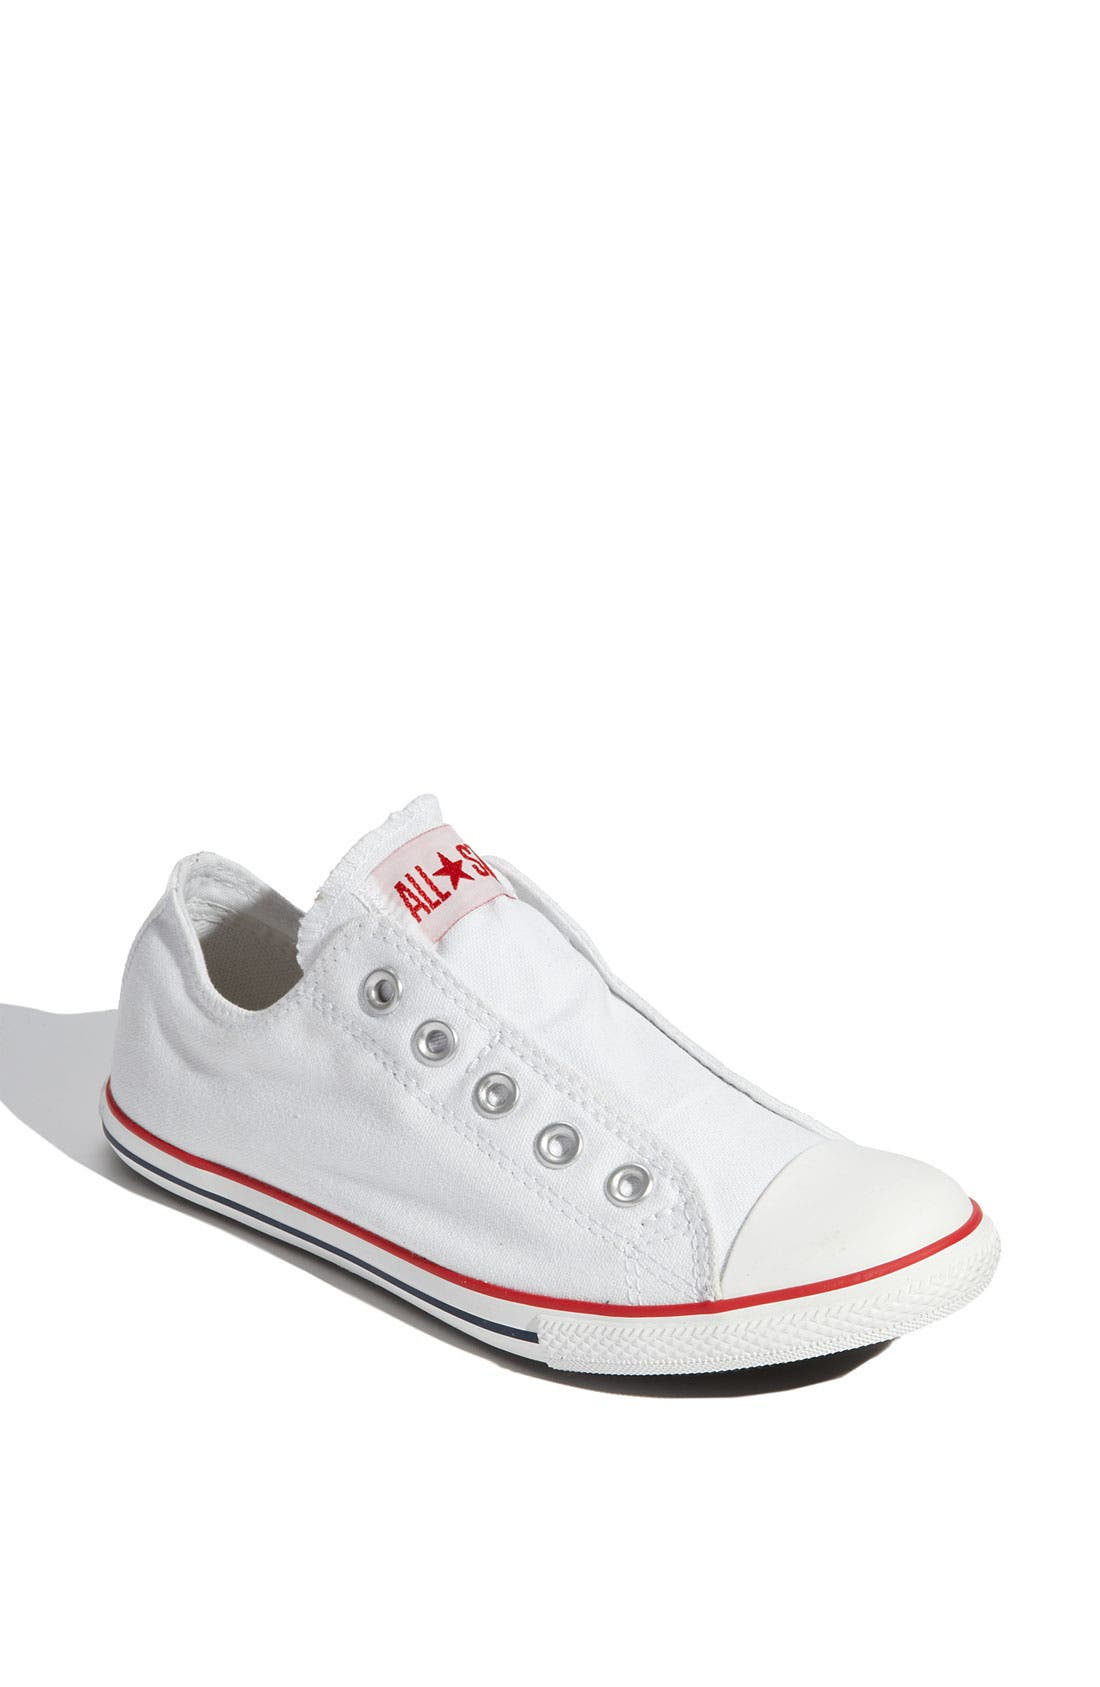 Main Image - Converse Chuck Taylor® All Star® 'Slim' Slip-On